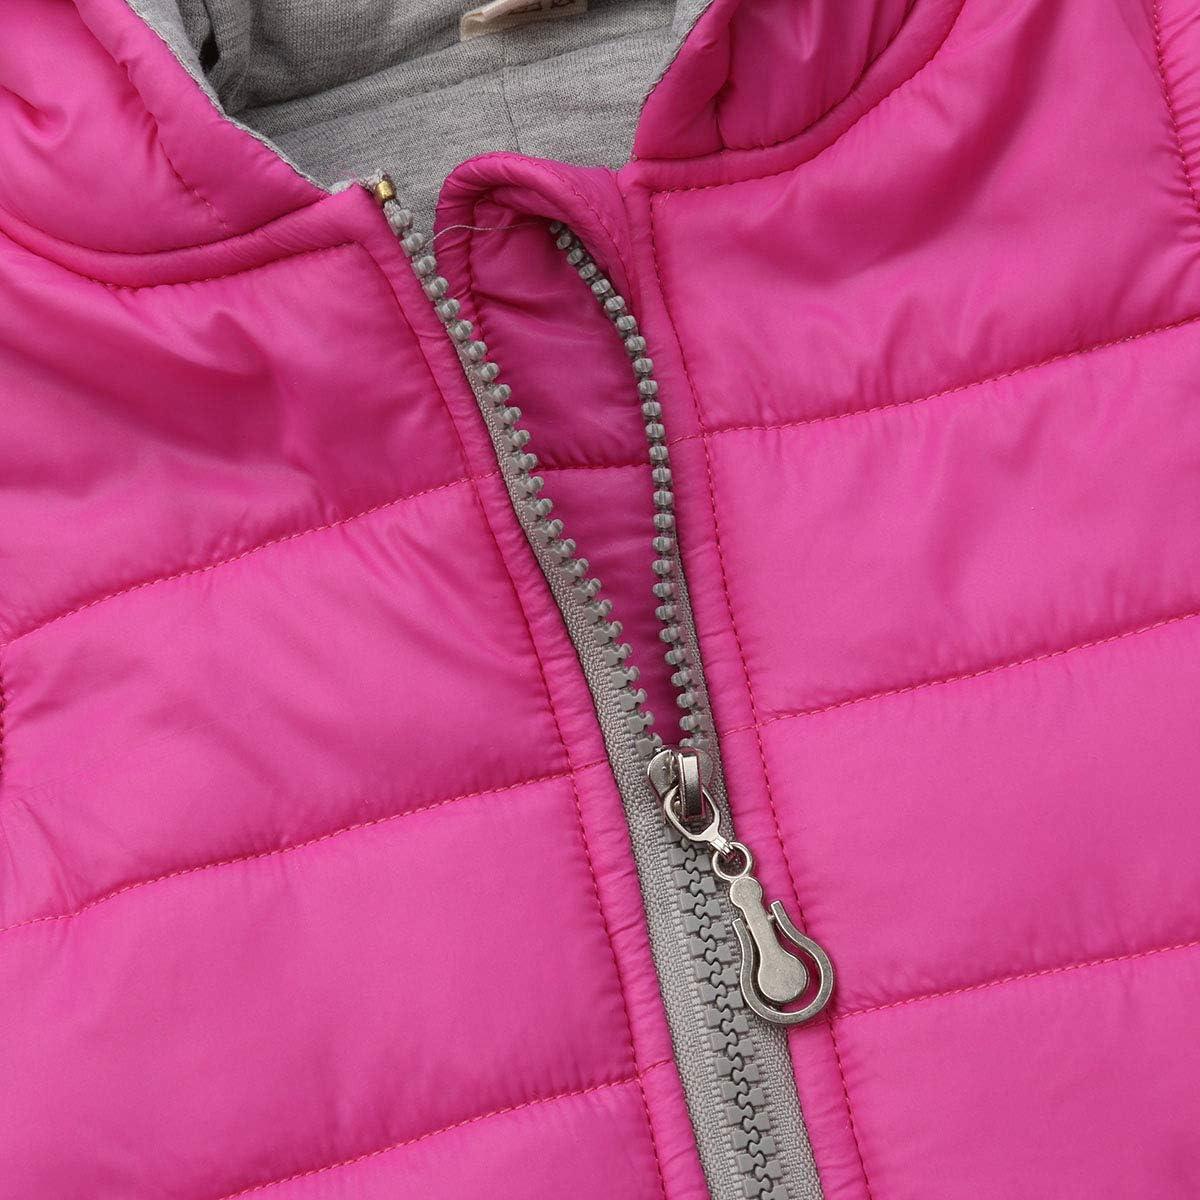 FEORJGP Toddler Baby Girl Boy Hoodies Vest Outwear 3D Dinosaur Sleeveless Waistcoat Warm Jacket Fall Winter Clothes